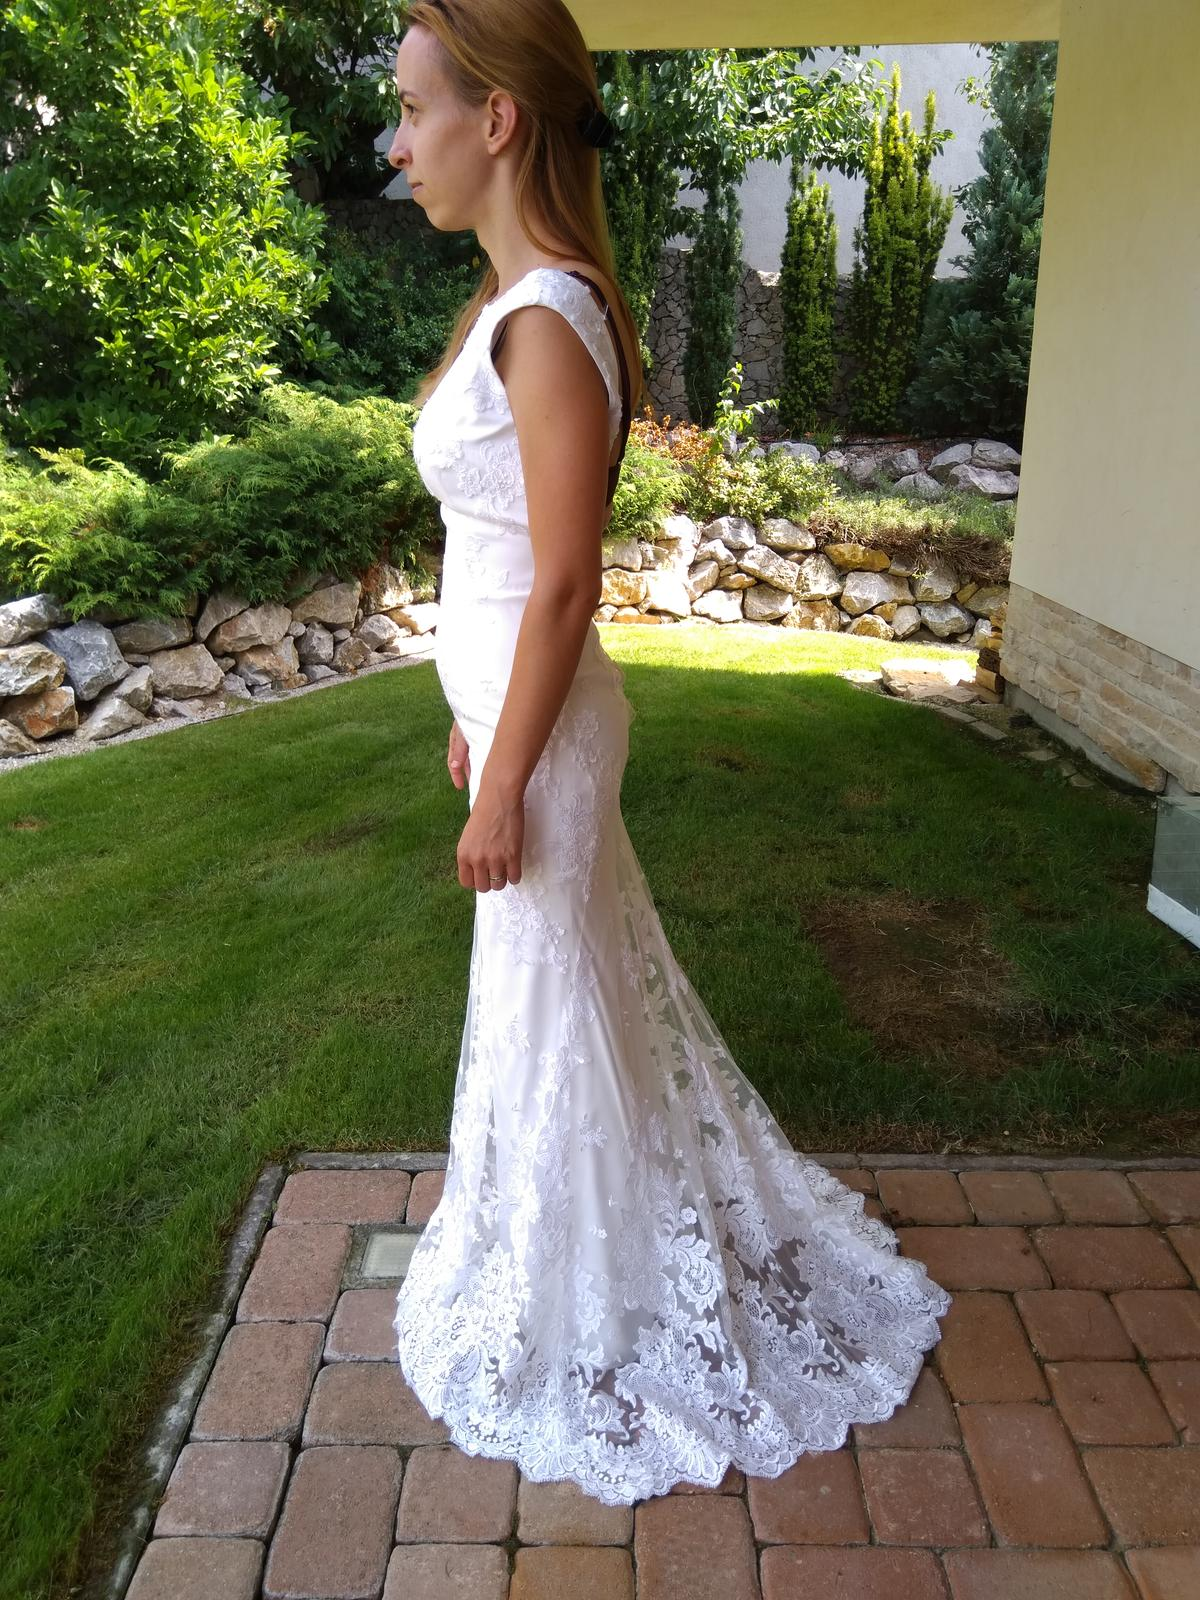 Svadobné šaty s jemnou čipkou a miernou vlečkou - Obrázok č. 1